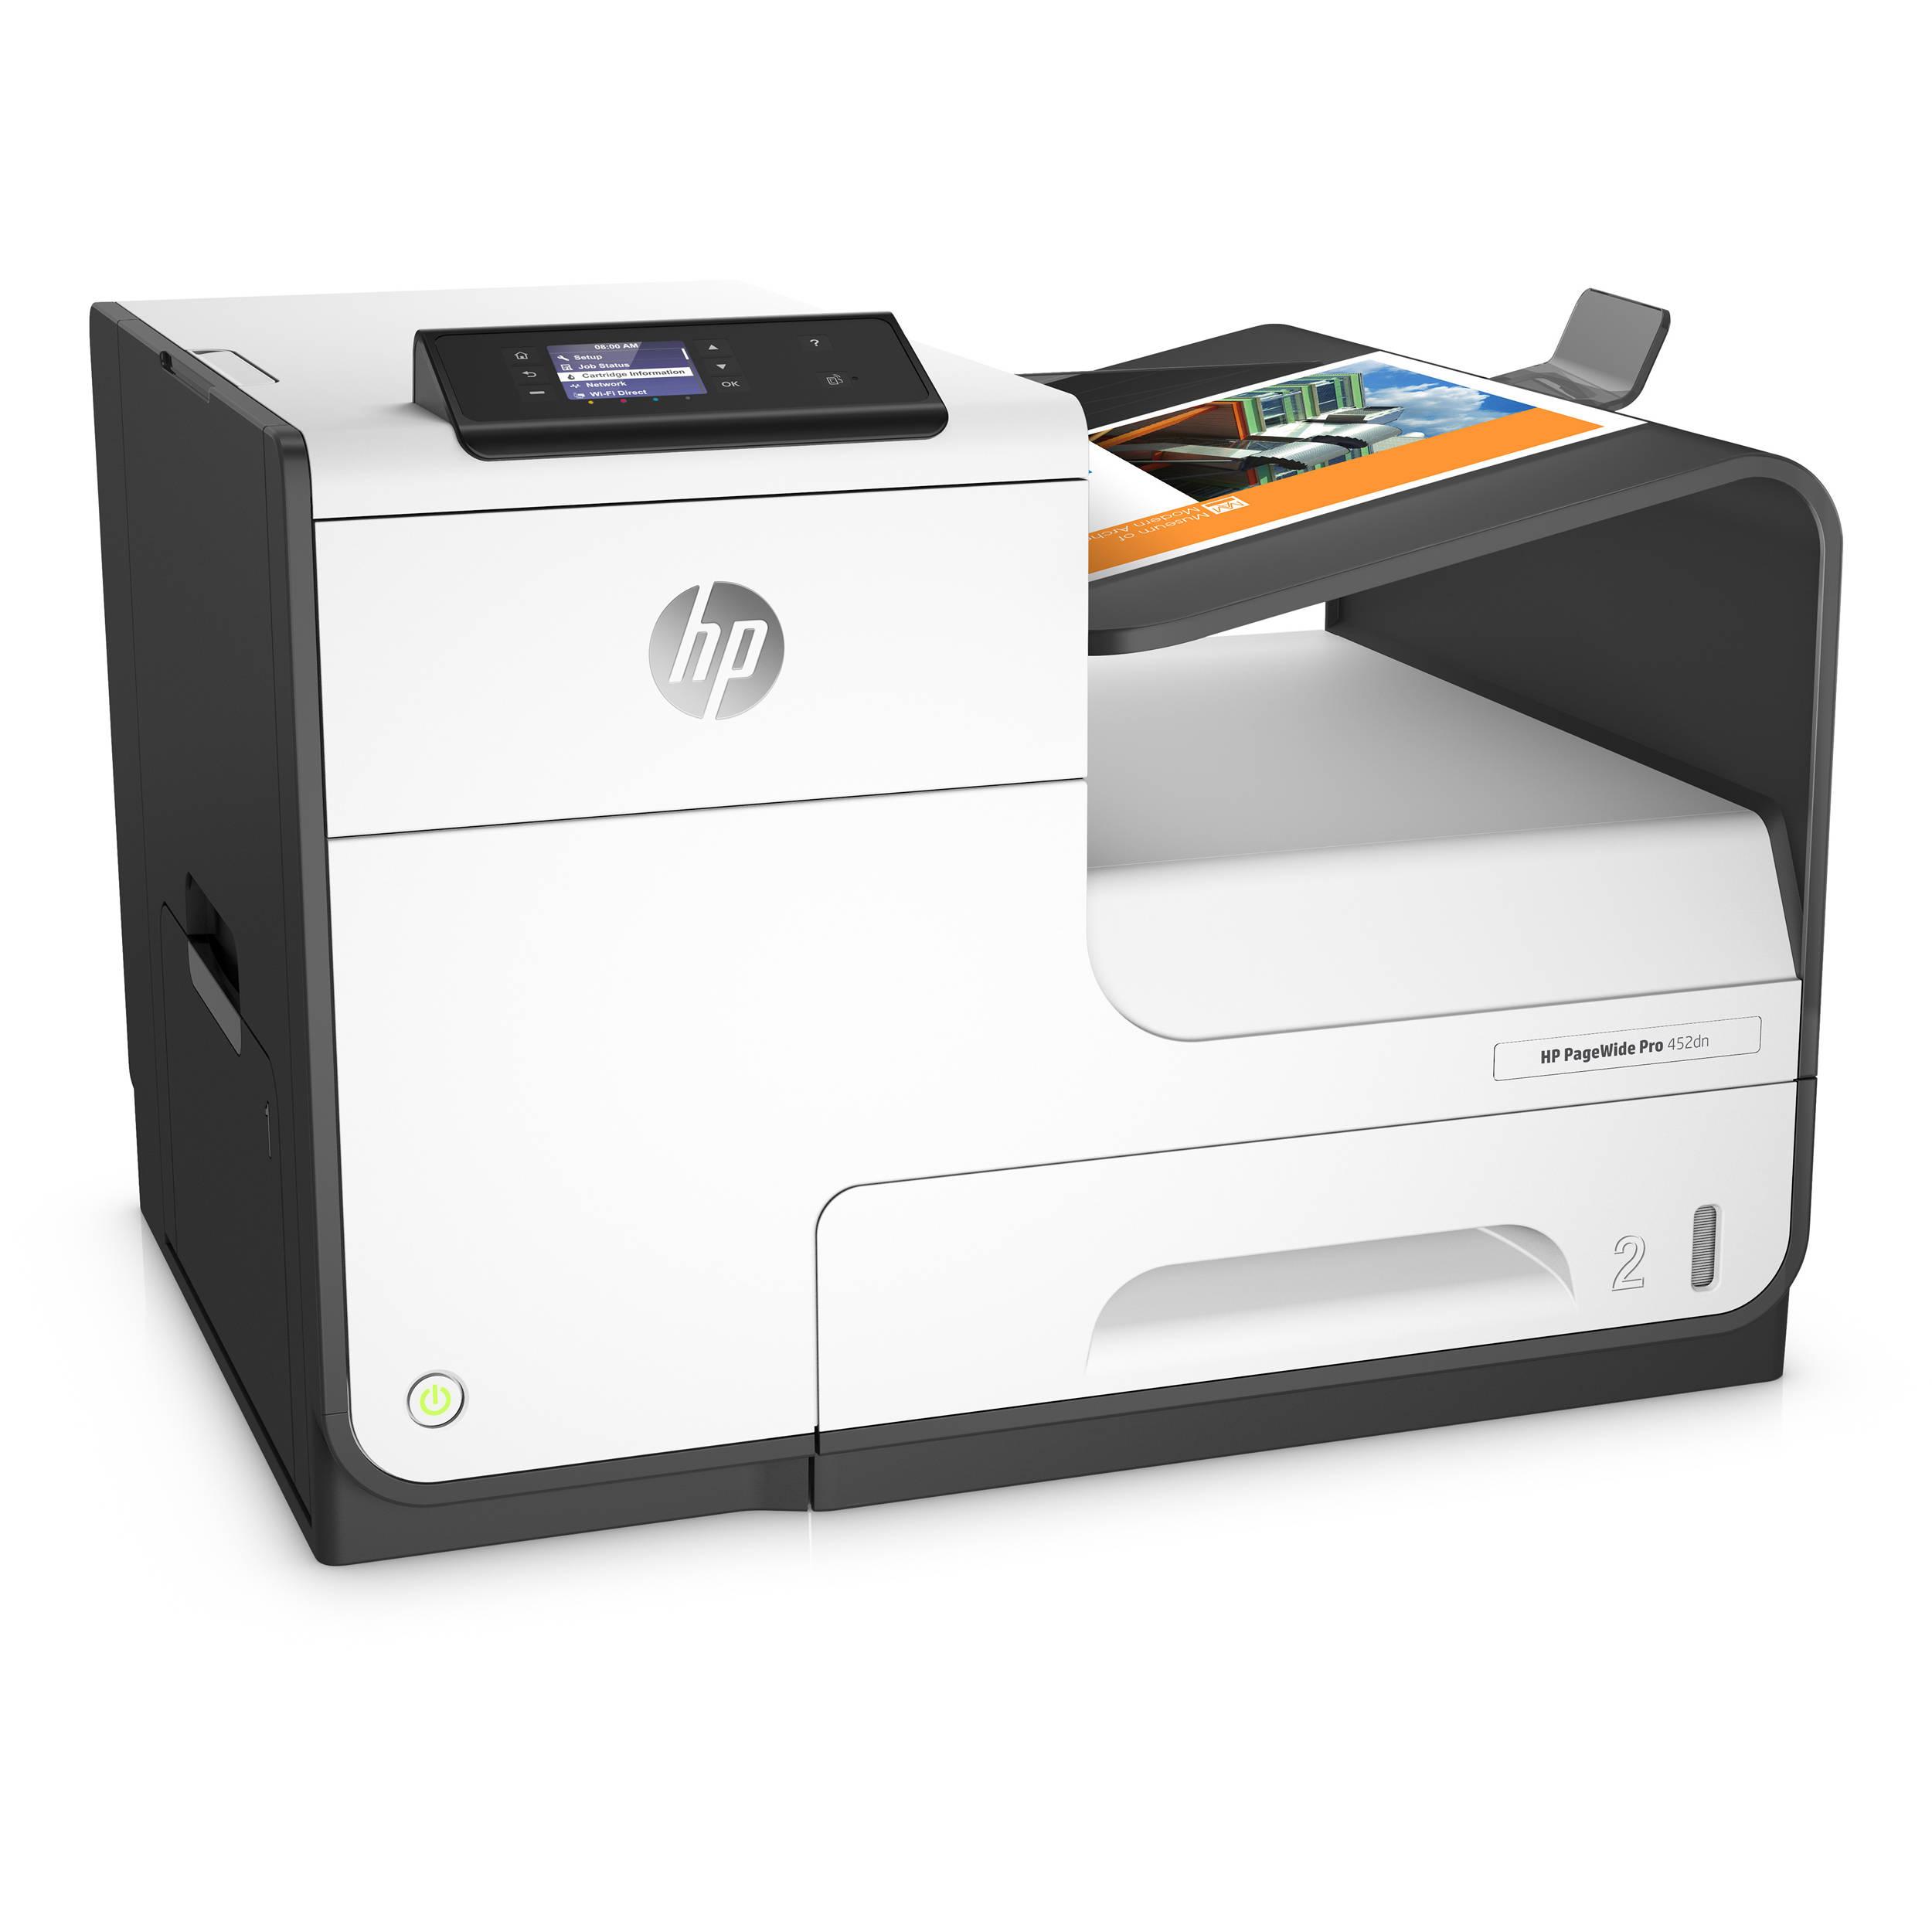 Hp Pagewide Pro 452dn Inkjet Printer D3q15a B1h B Amp H Photo